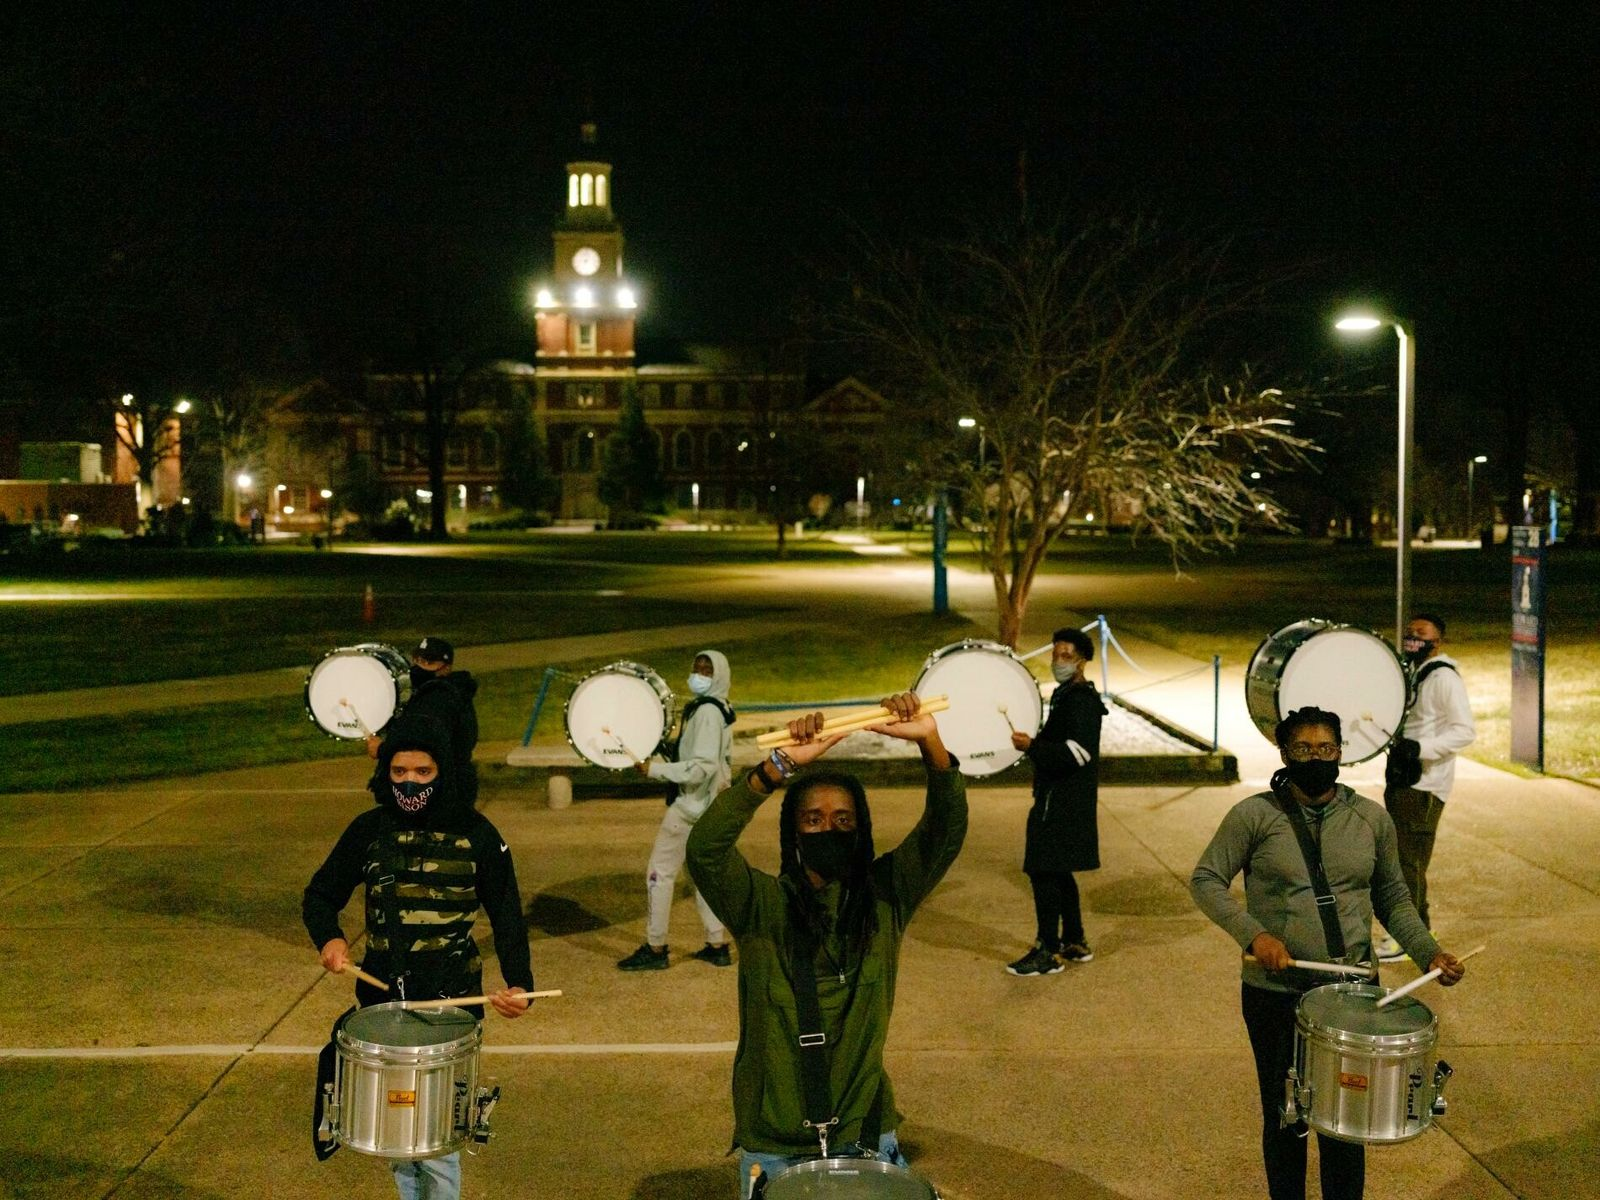 La Showtime March Band de la Universidad Howard